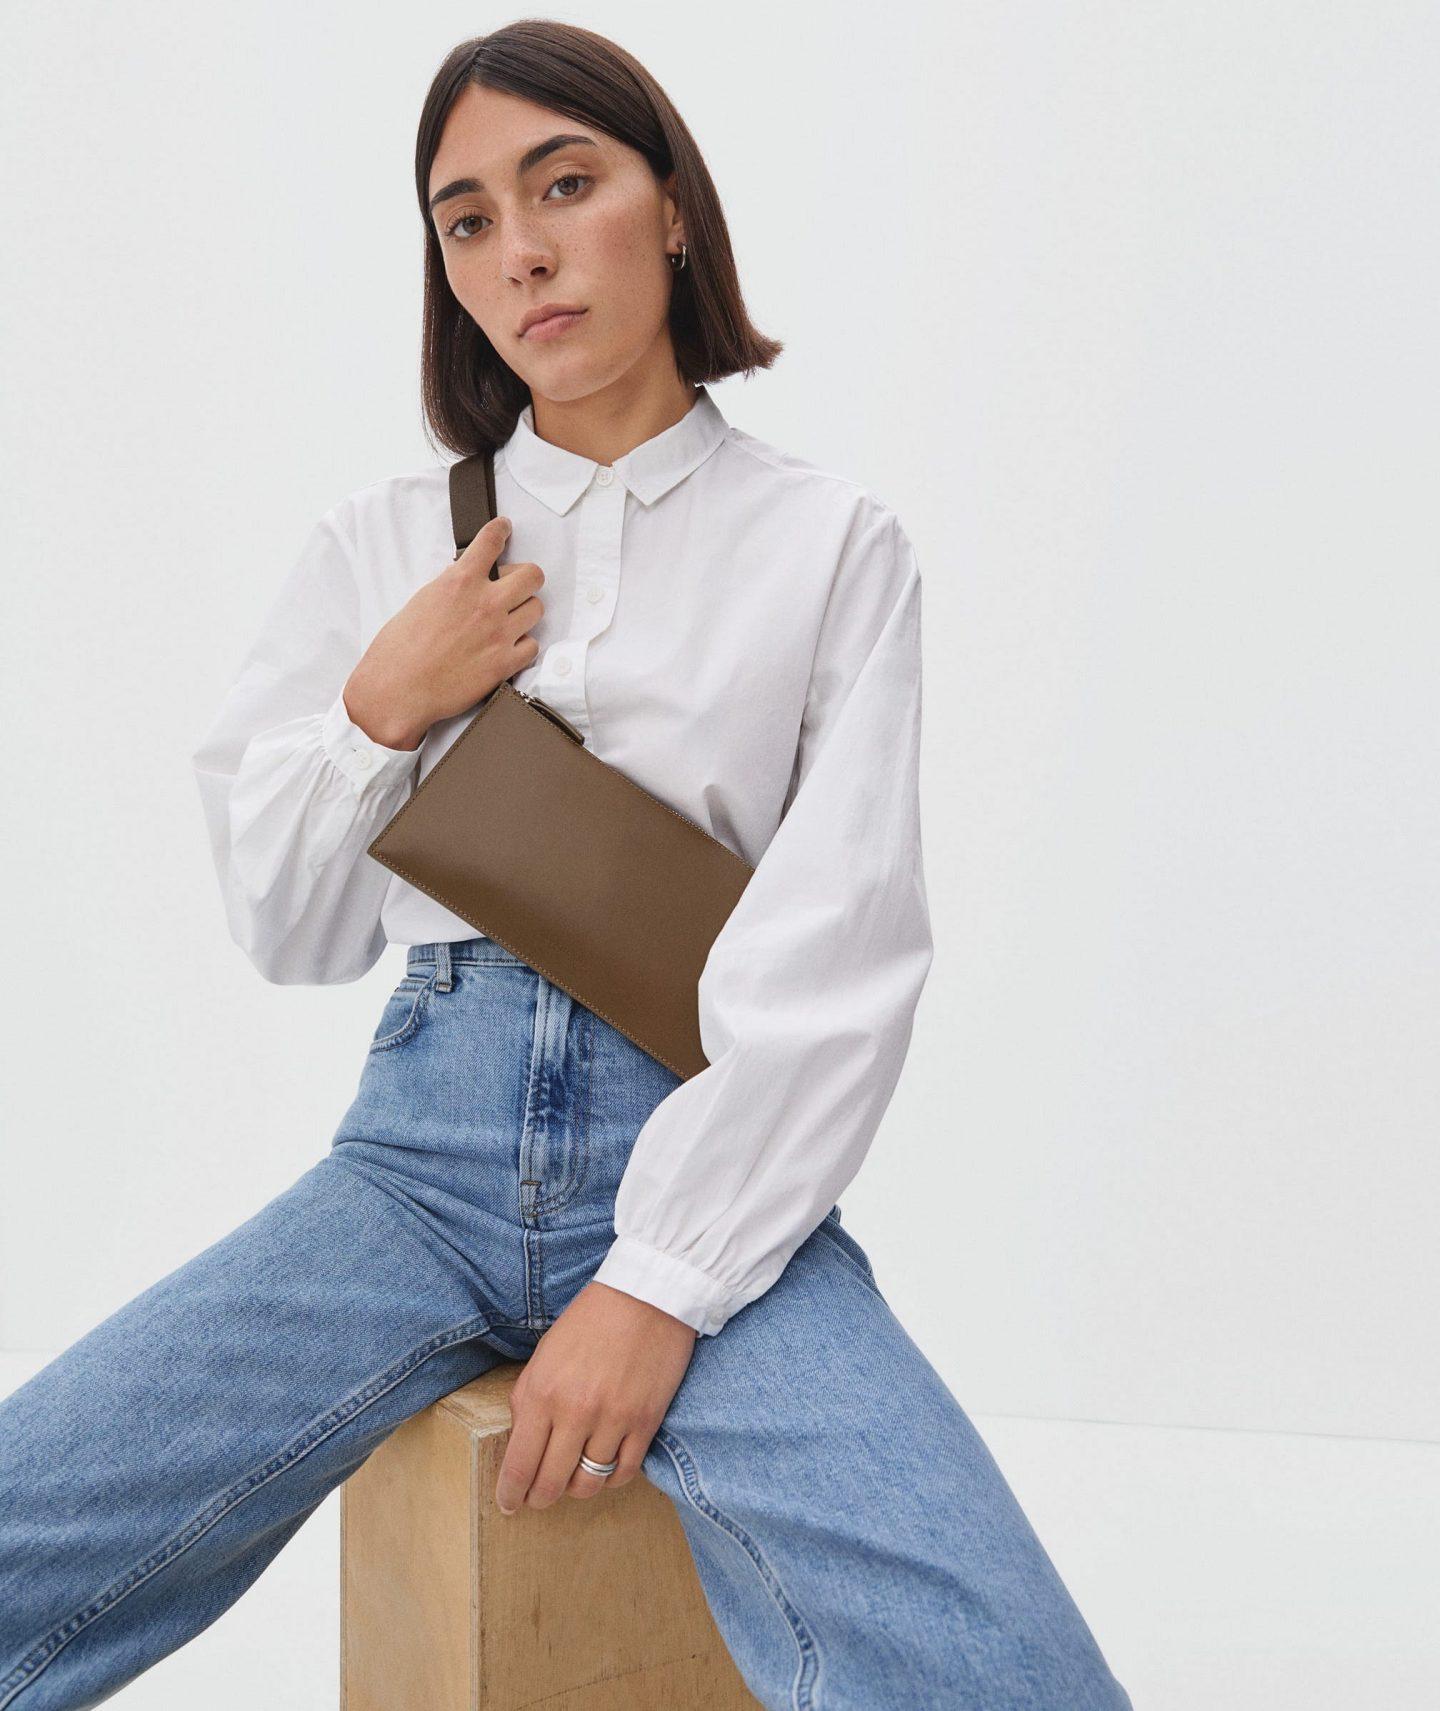 Brown minimalist sling bag from Everlane